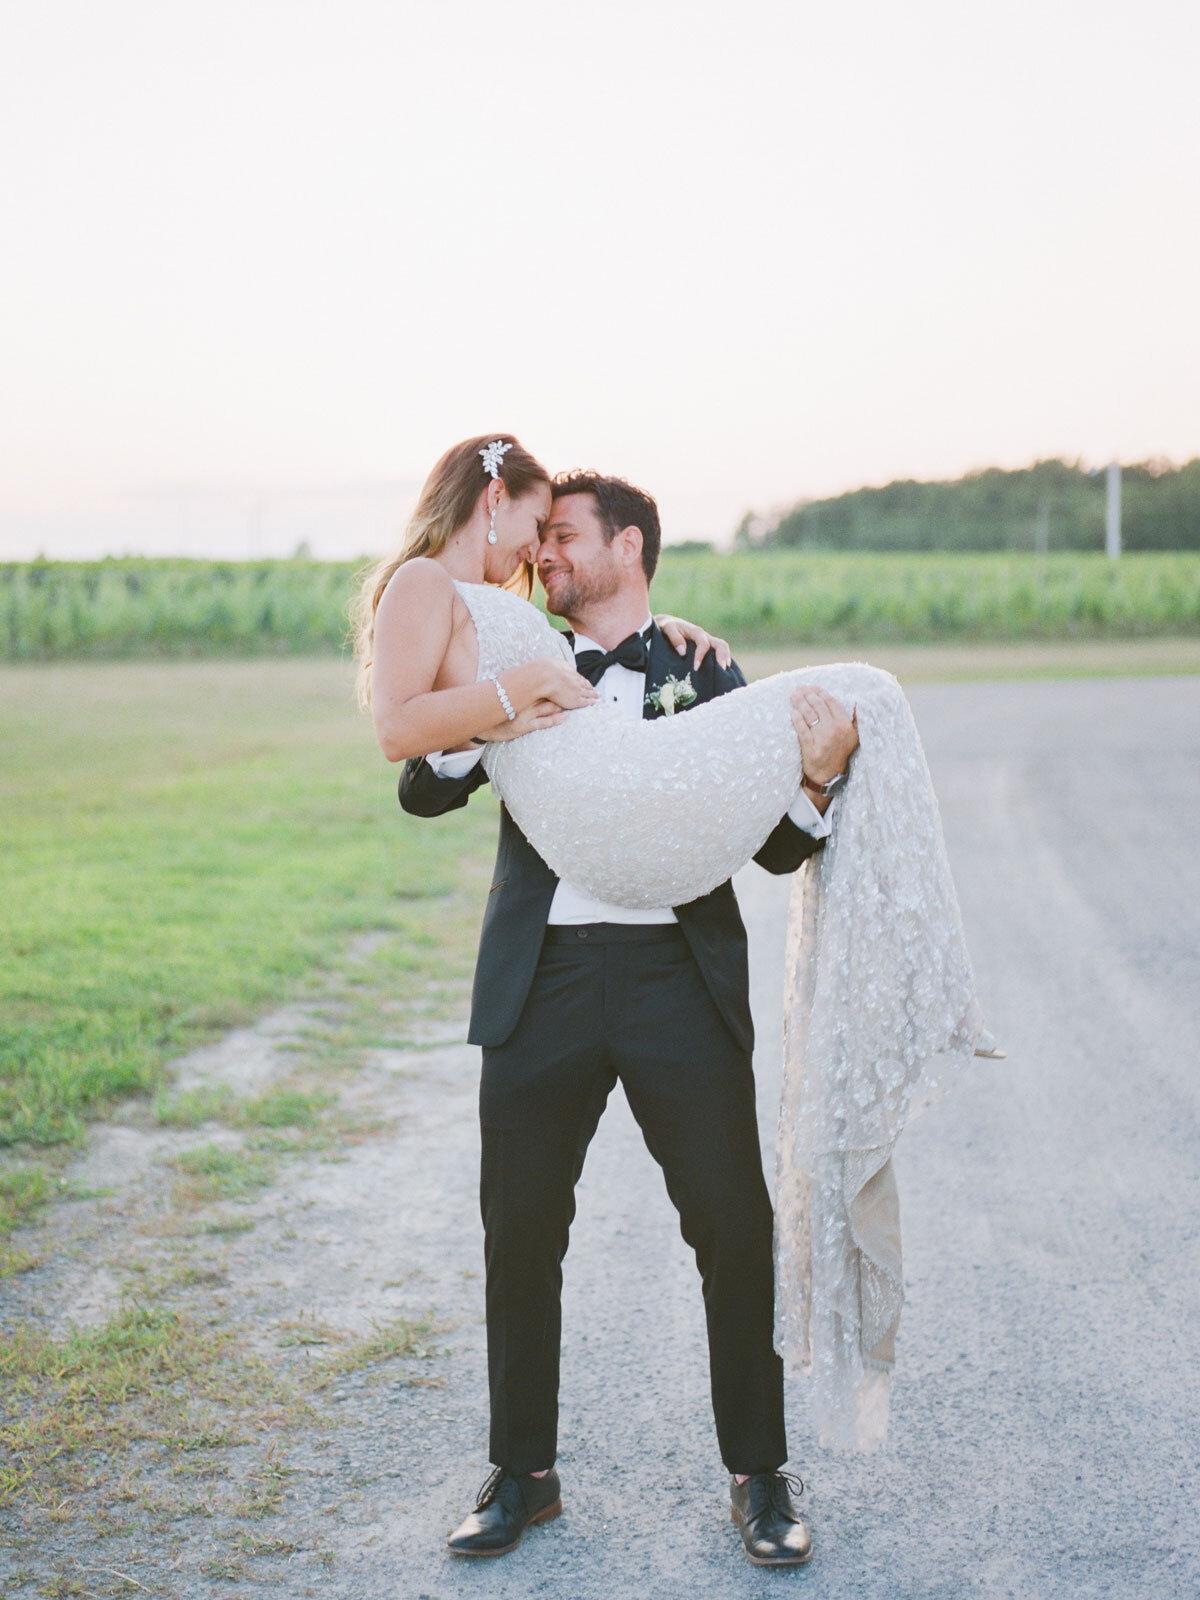 Chateau-des-Charmes-Wedding-Summer-Vineyard-Bride-Niagara-on-the-Lake-photos-by-Gemini-Photography-Ontario-0080.jpg